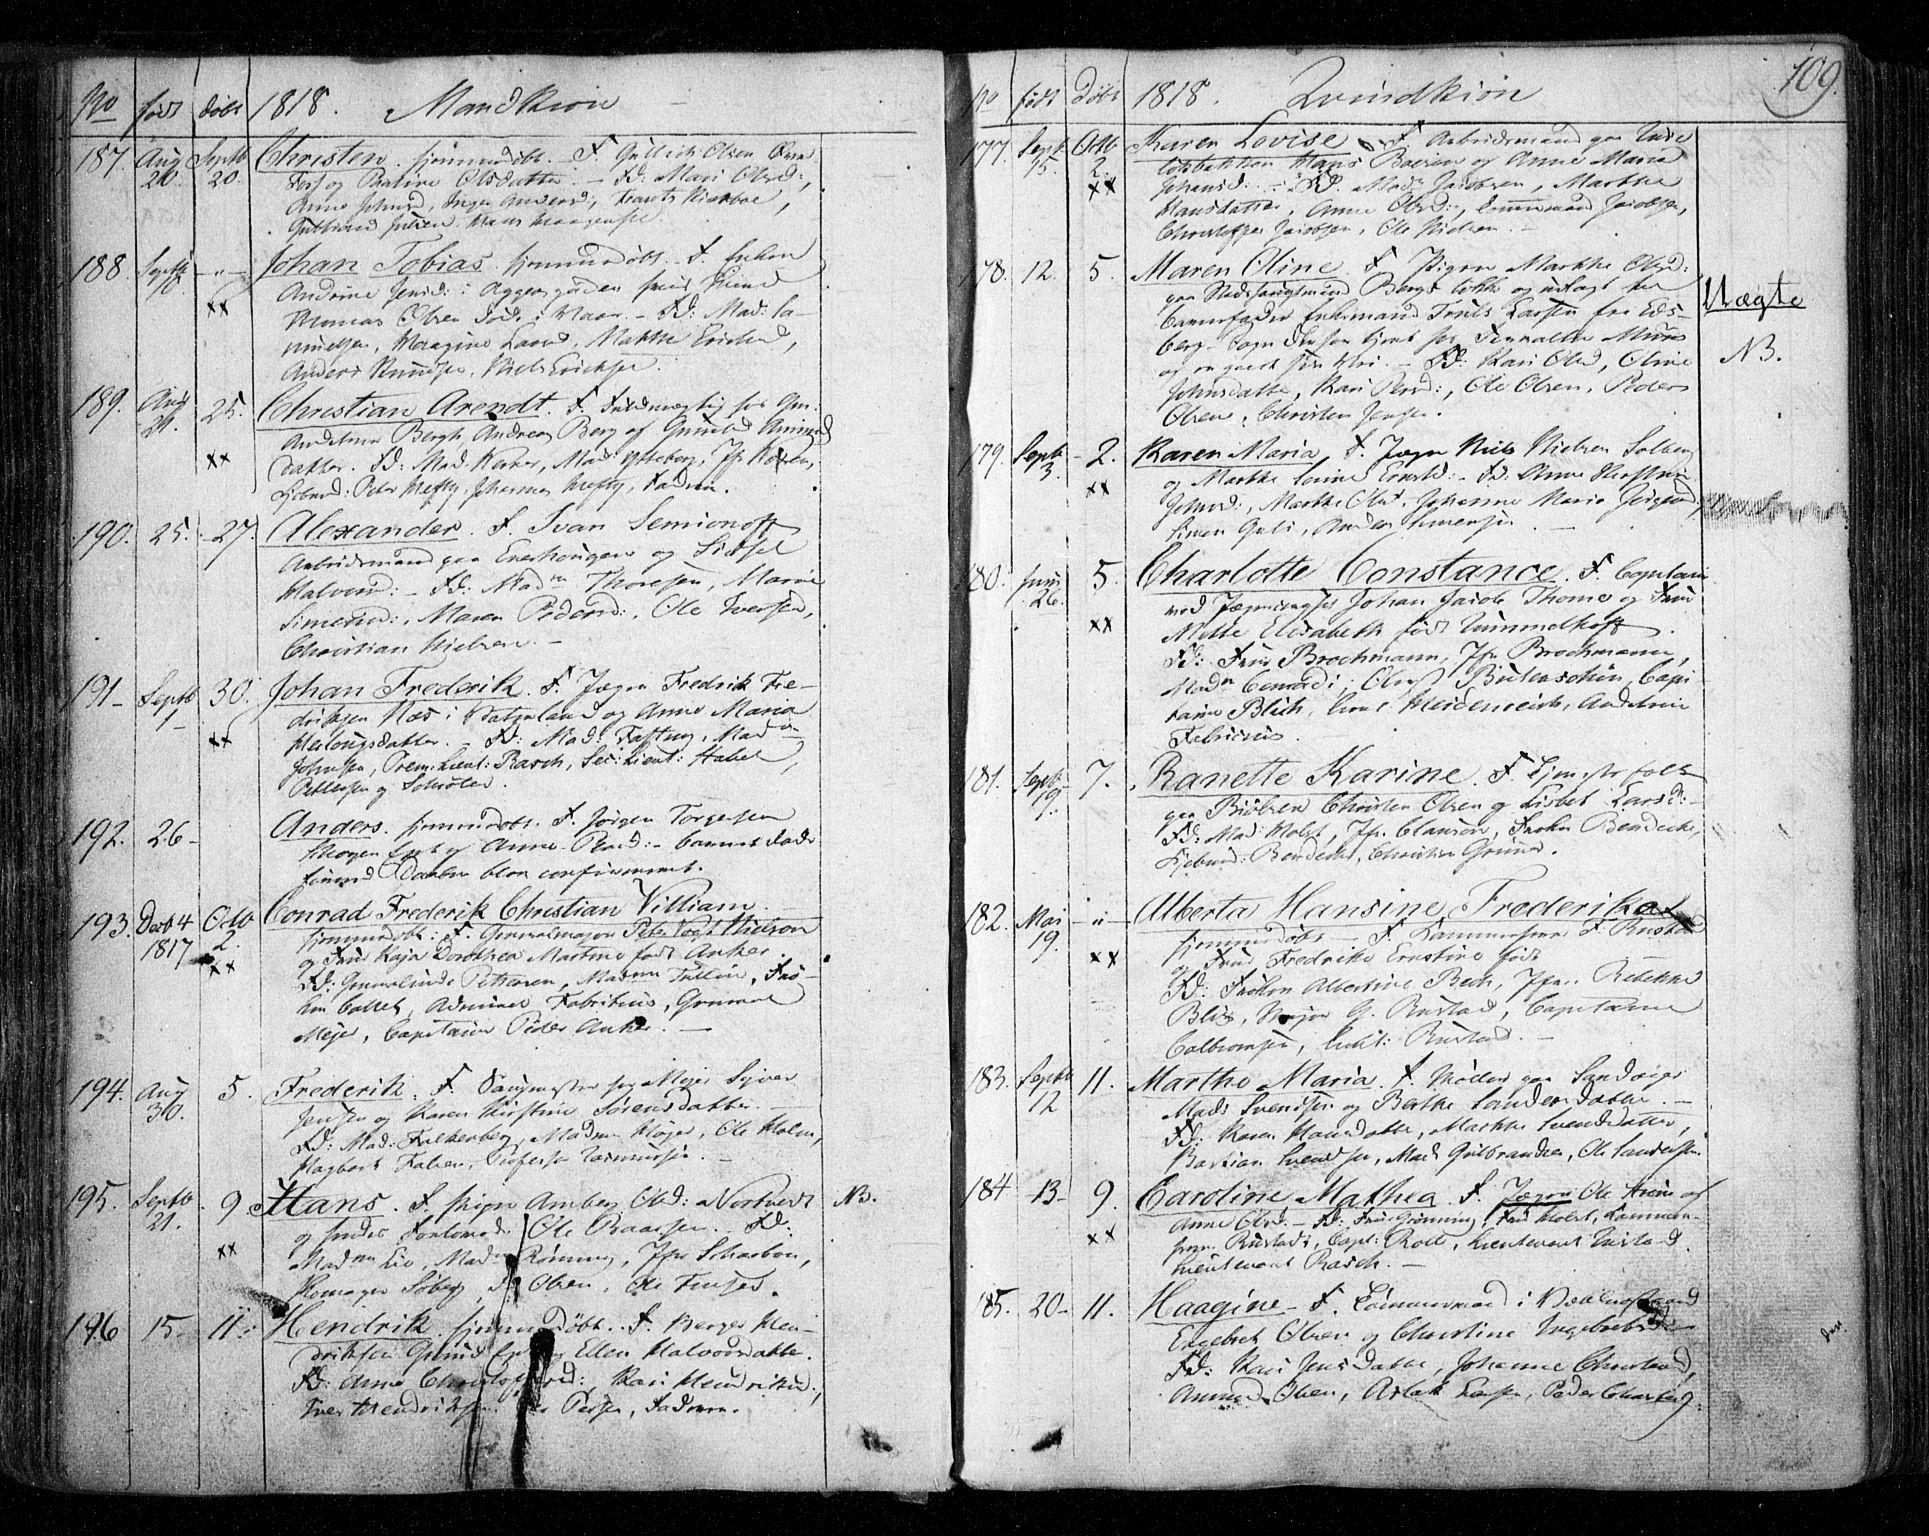 SAO, Aker prestekontor kirkebøker, F/L0011: Parish register (official) no. 11, 1810-1819, p. 109